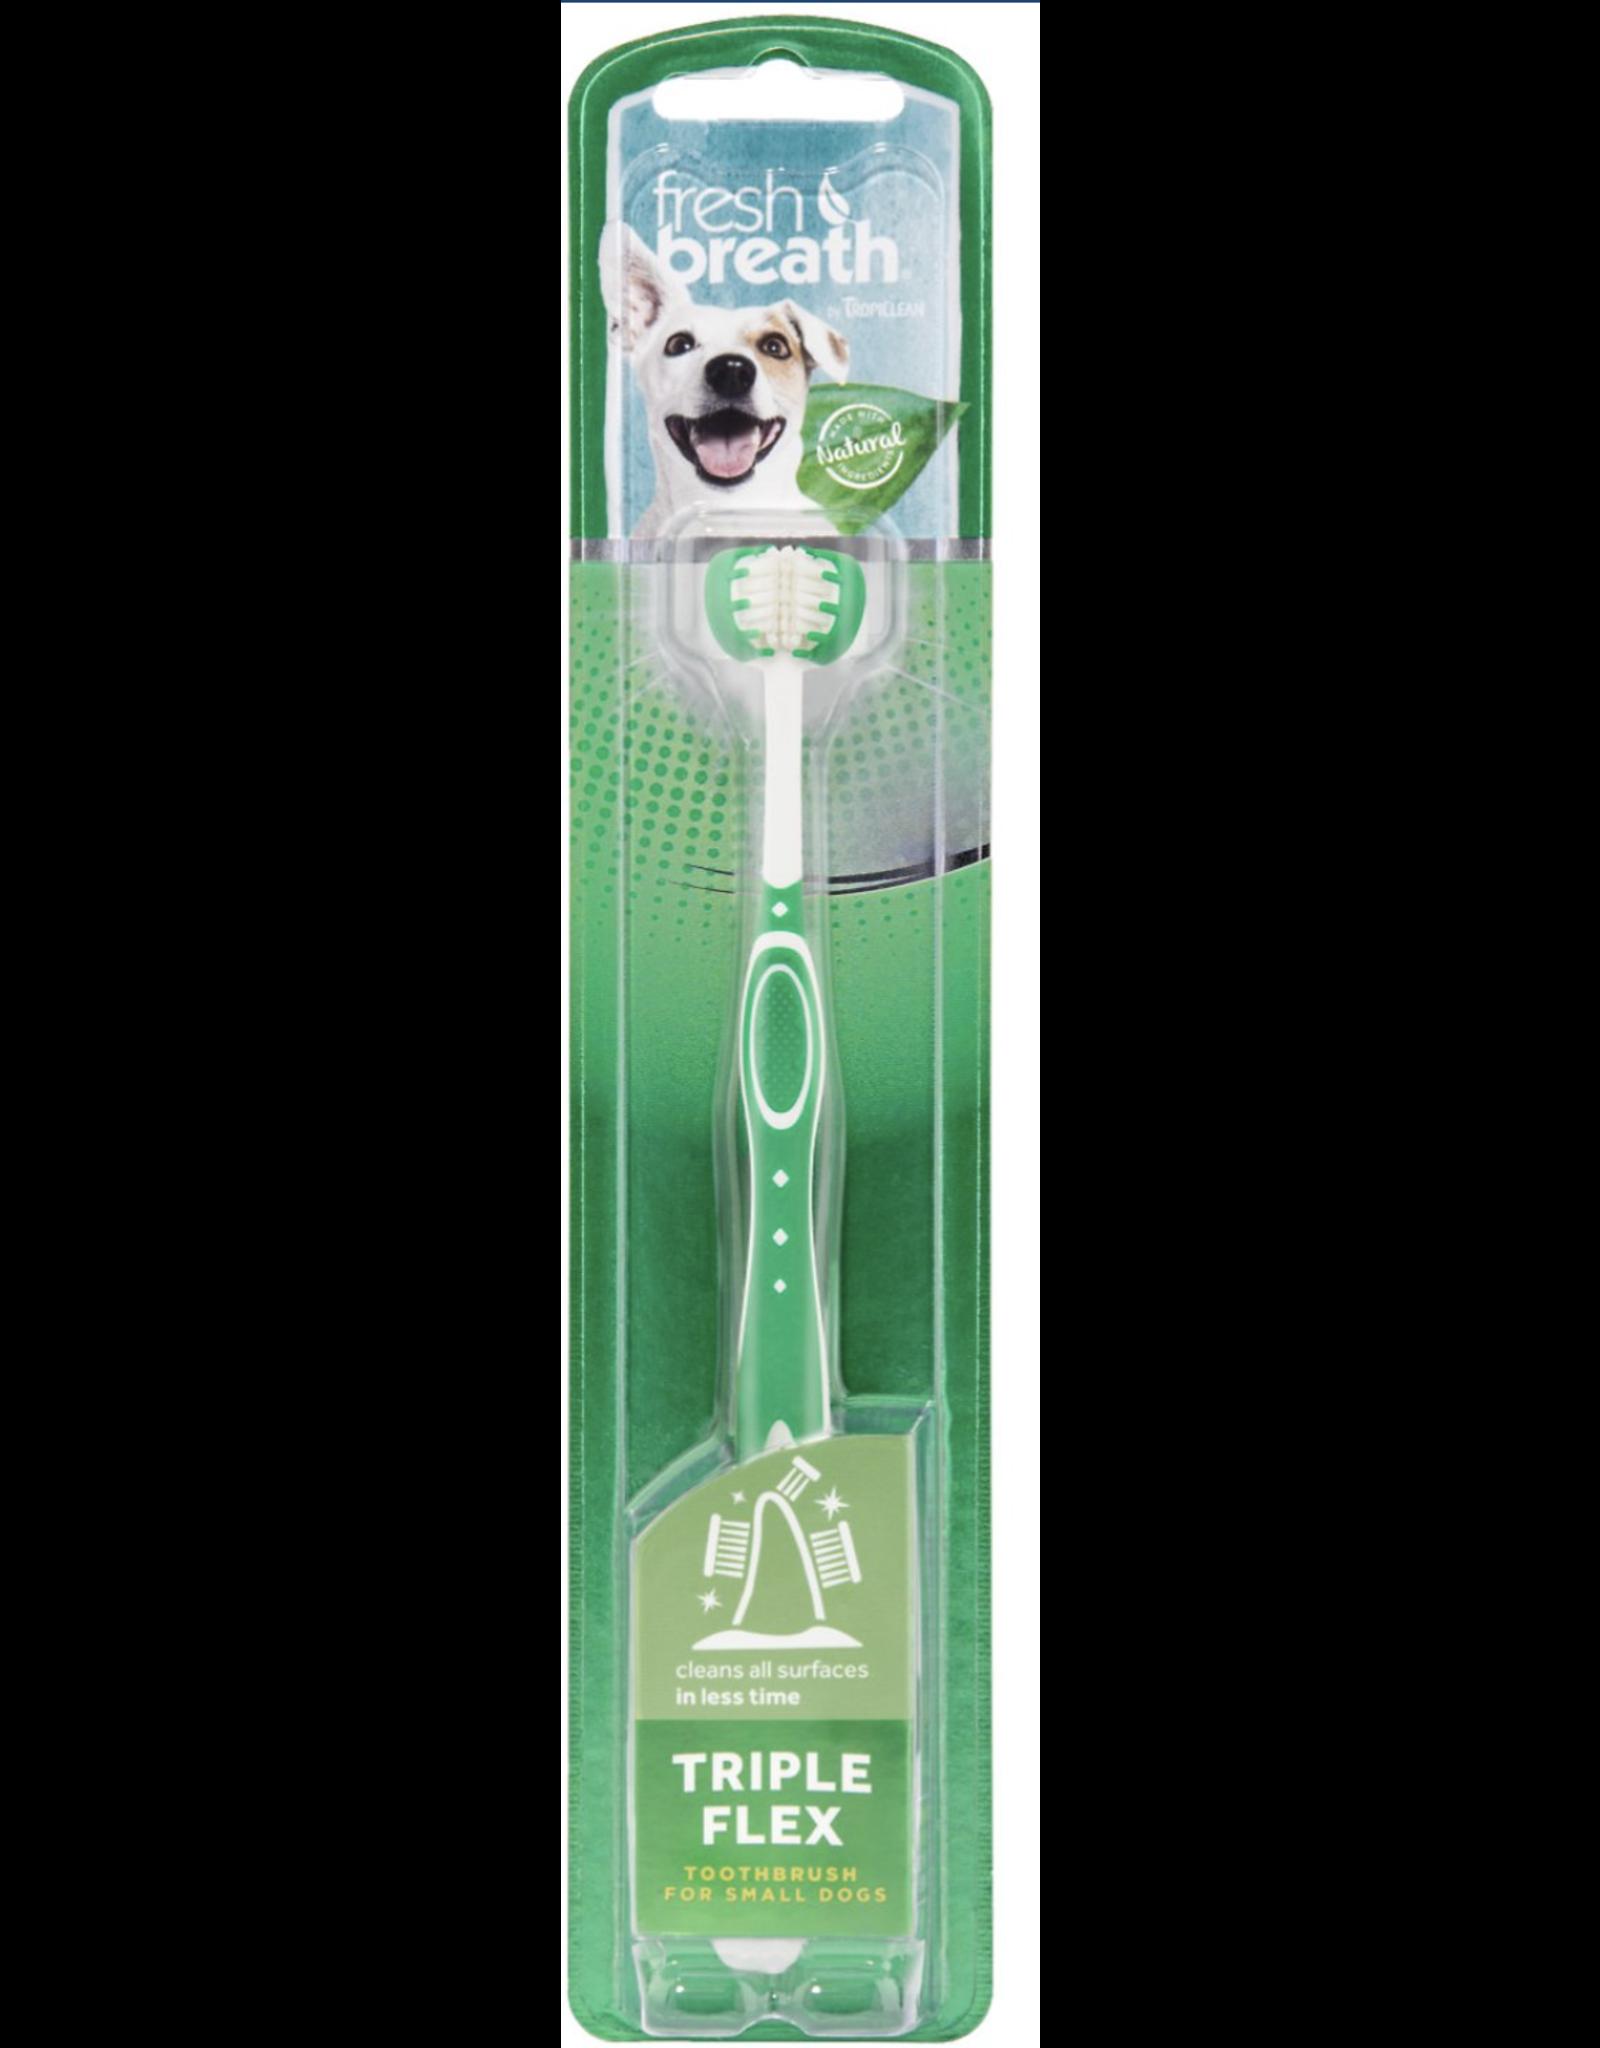 TropiClean TropiClean Fresh Breath Tripleflex Dog Toothbrush SM